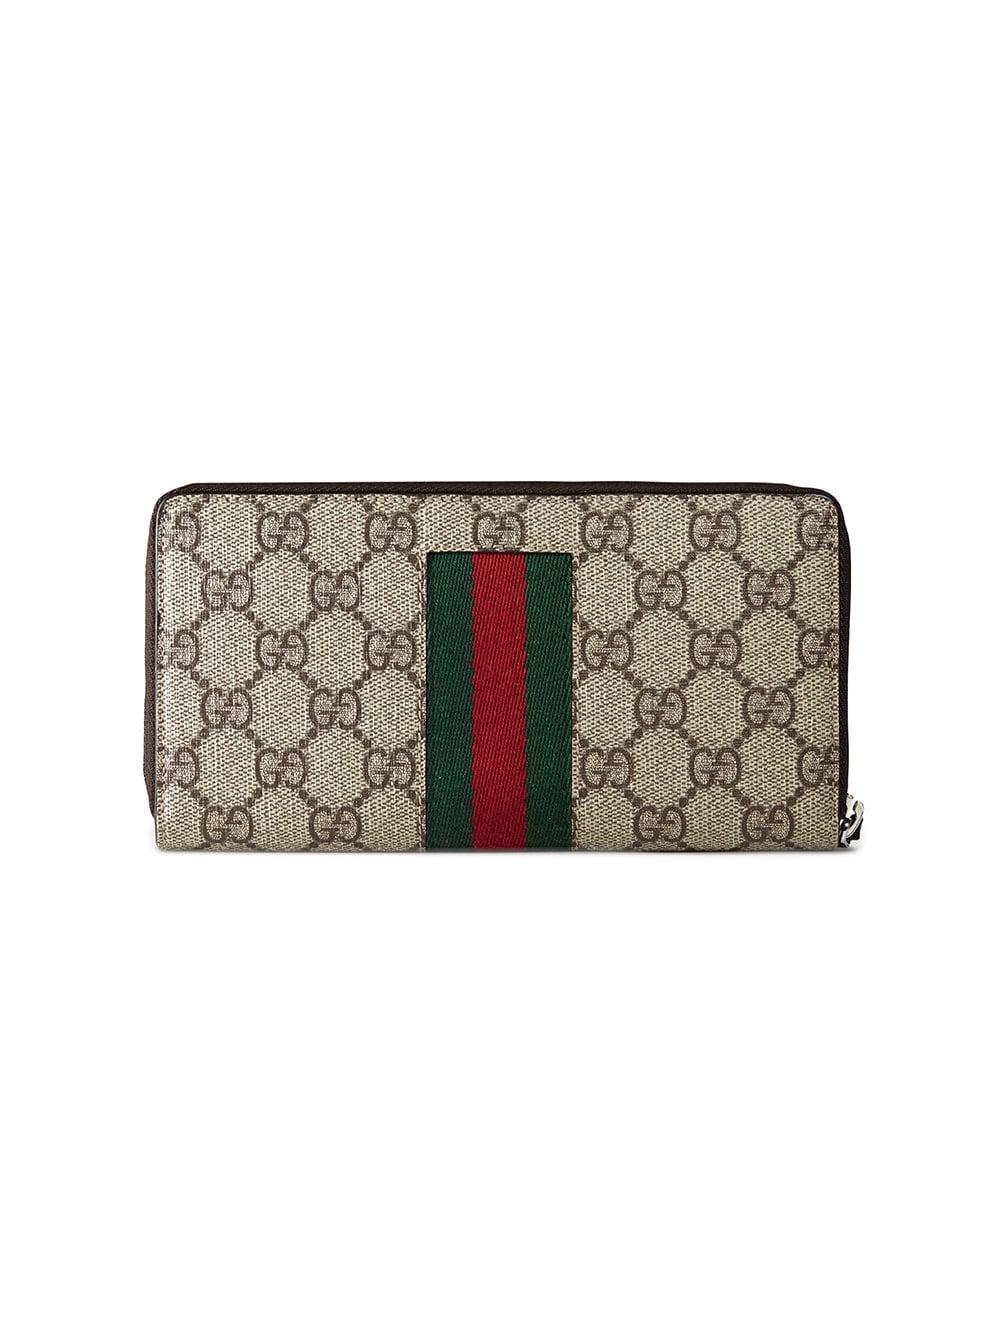 ed22e7380238 Gucci Beige Web GG Supreme Zip Around Wallet for Men - Save 12% - Lyst